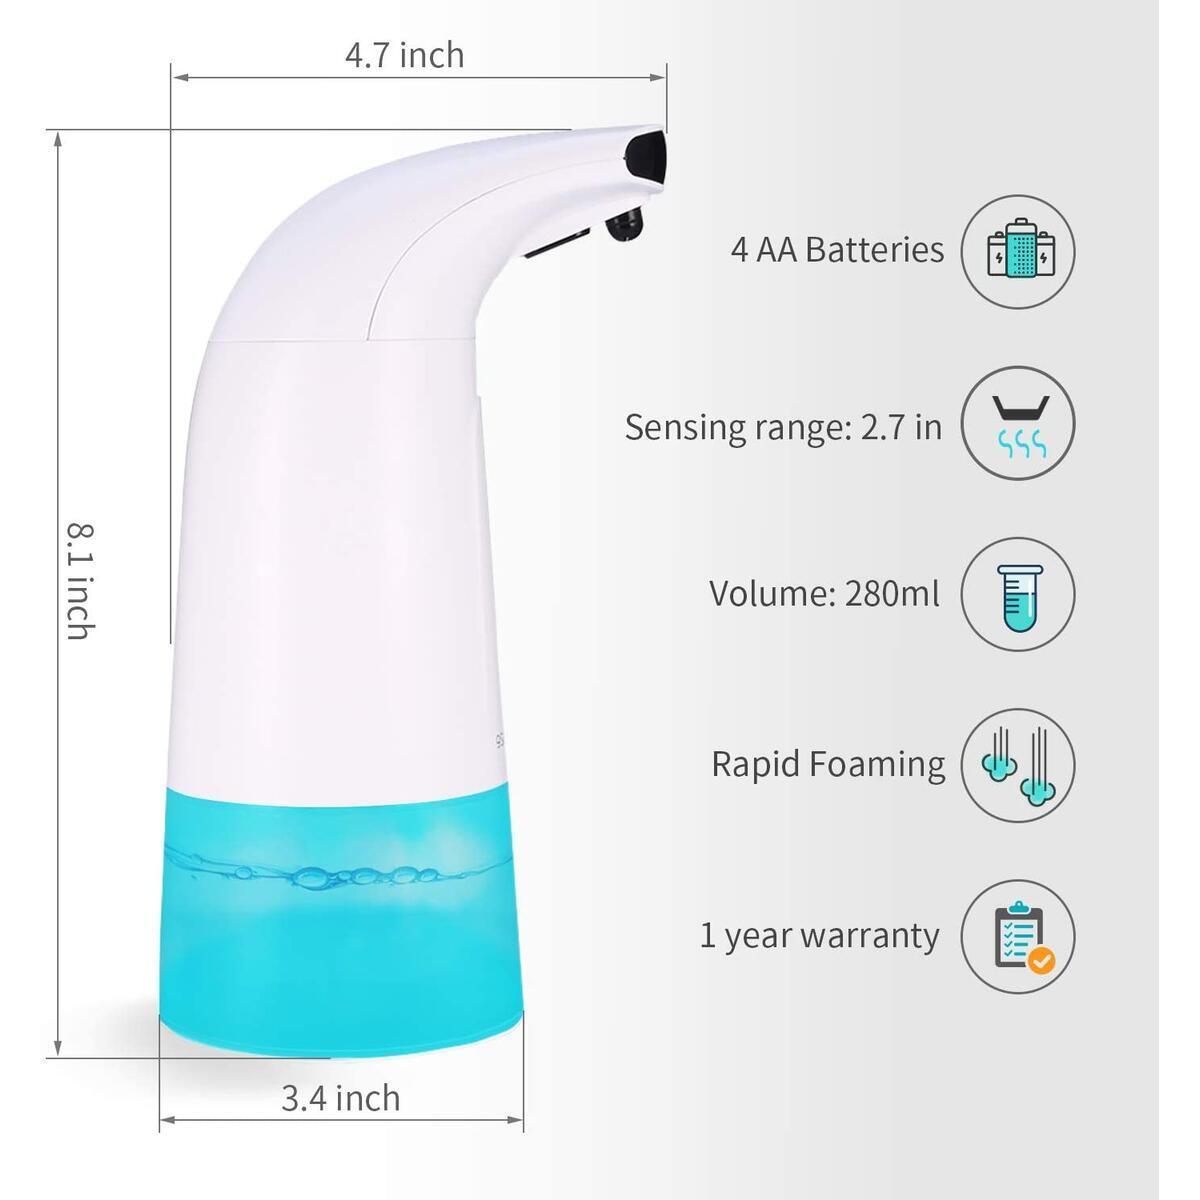 Greenize Soap Dispenser Touchless 280ml, Automatic Foaming Soap Dispenser Touchless Battery Operated, Countertop Hands Free Soap Dispenser Foaming Soap Pump for Bathroom Kitchen Kindergarten Hospital